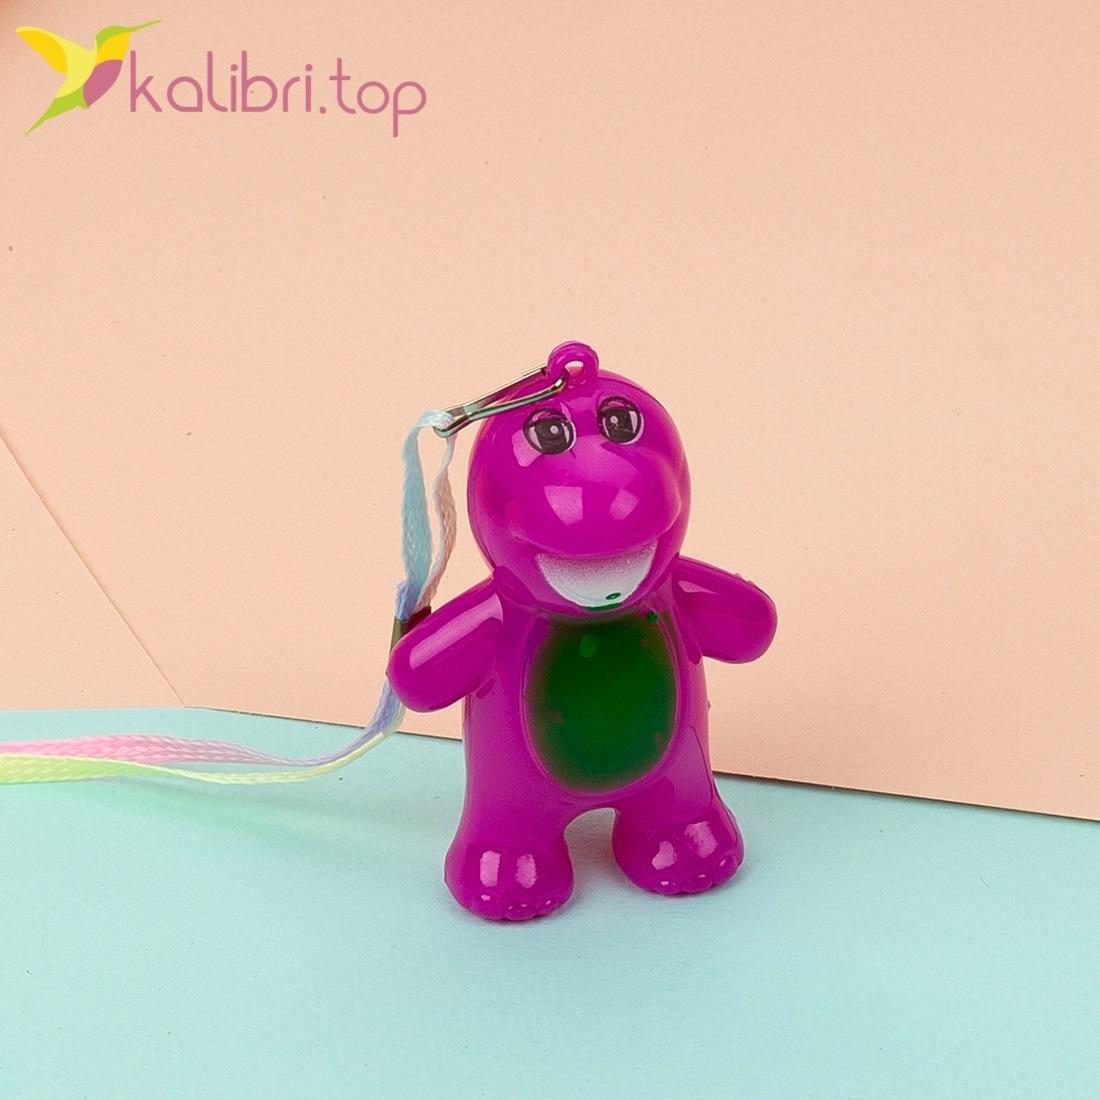 Детский кулон Динозавр, оптом - фото 2